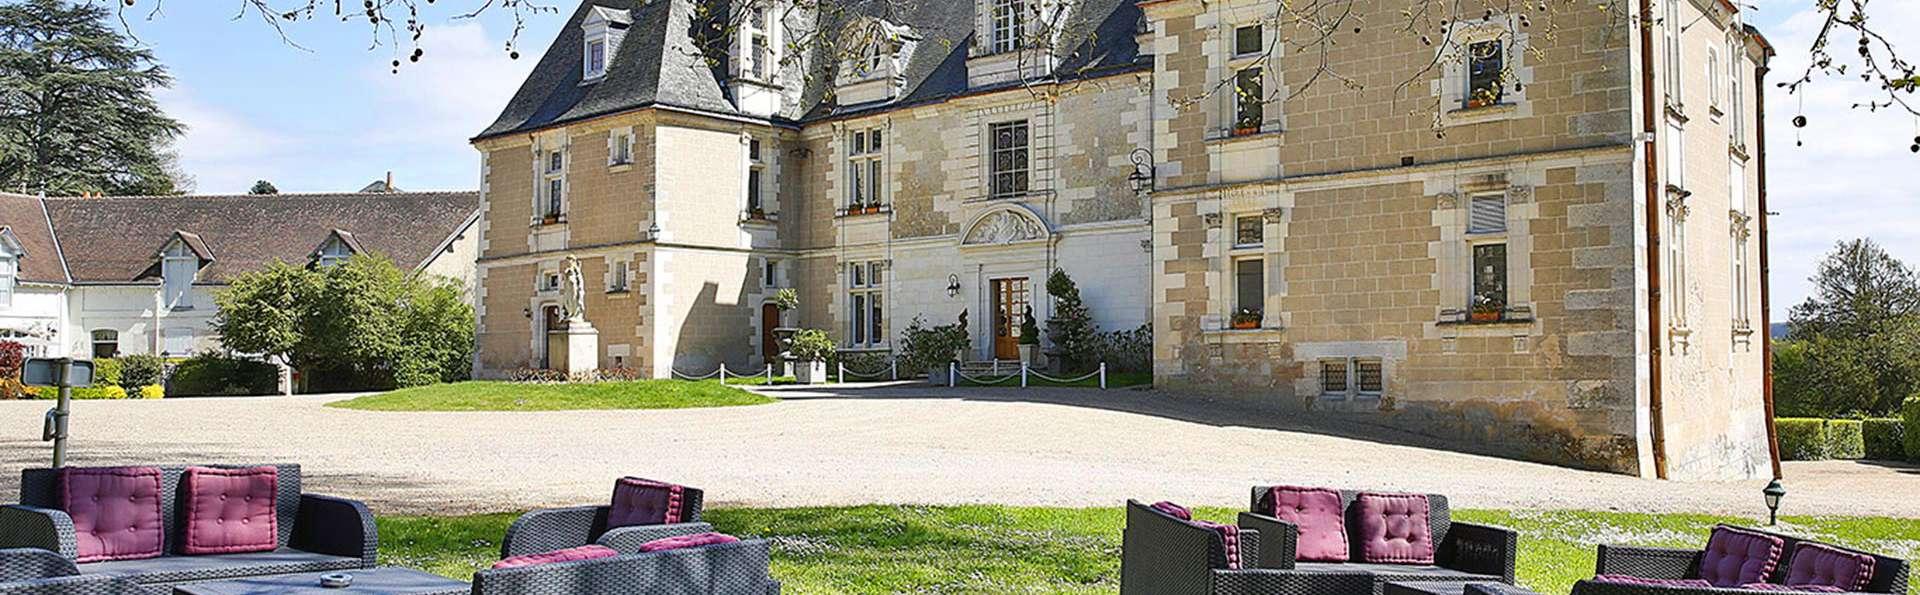 Château de Noizay - edit_facade1.jpg